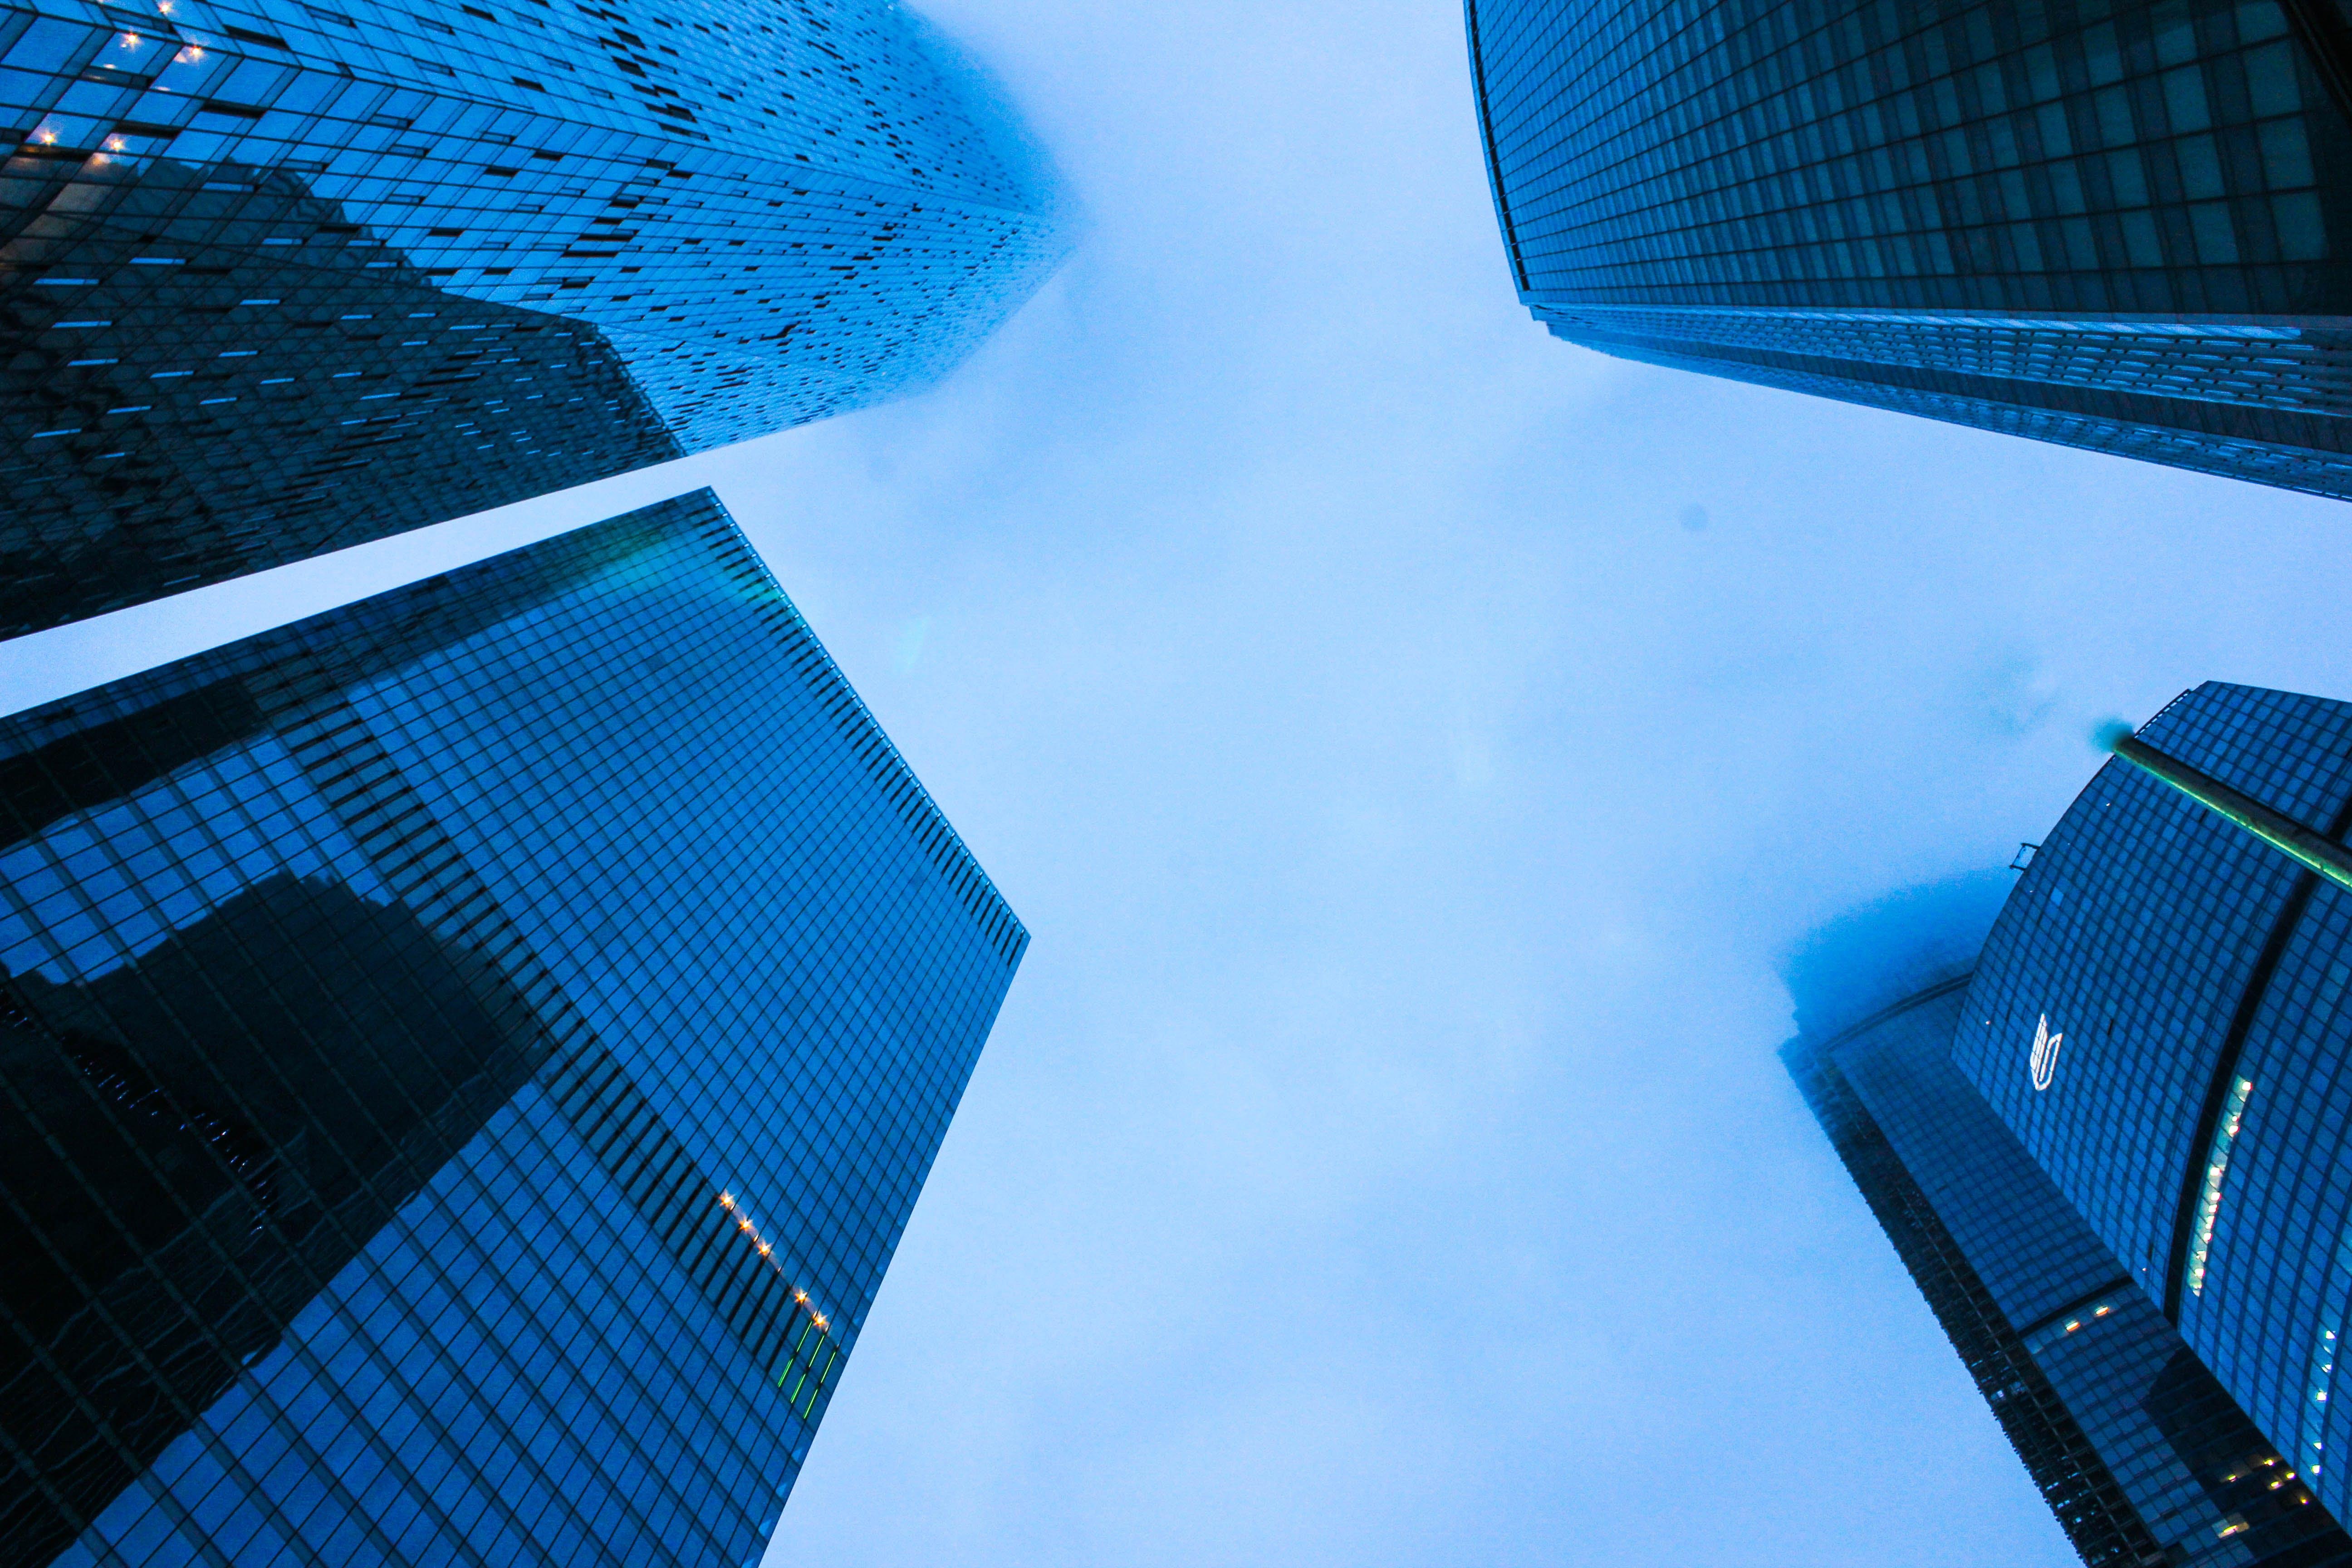 Gratis arkivbilde med arkitektur, bygninger, dagslys, futuristisk